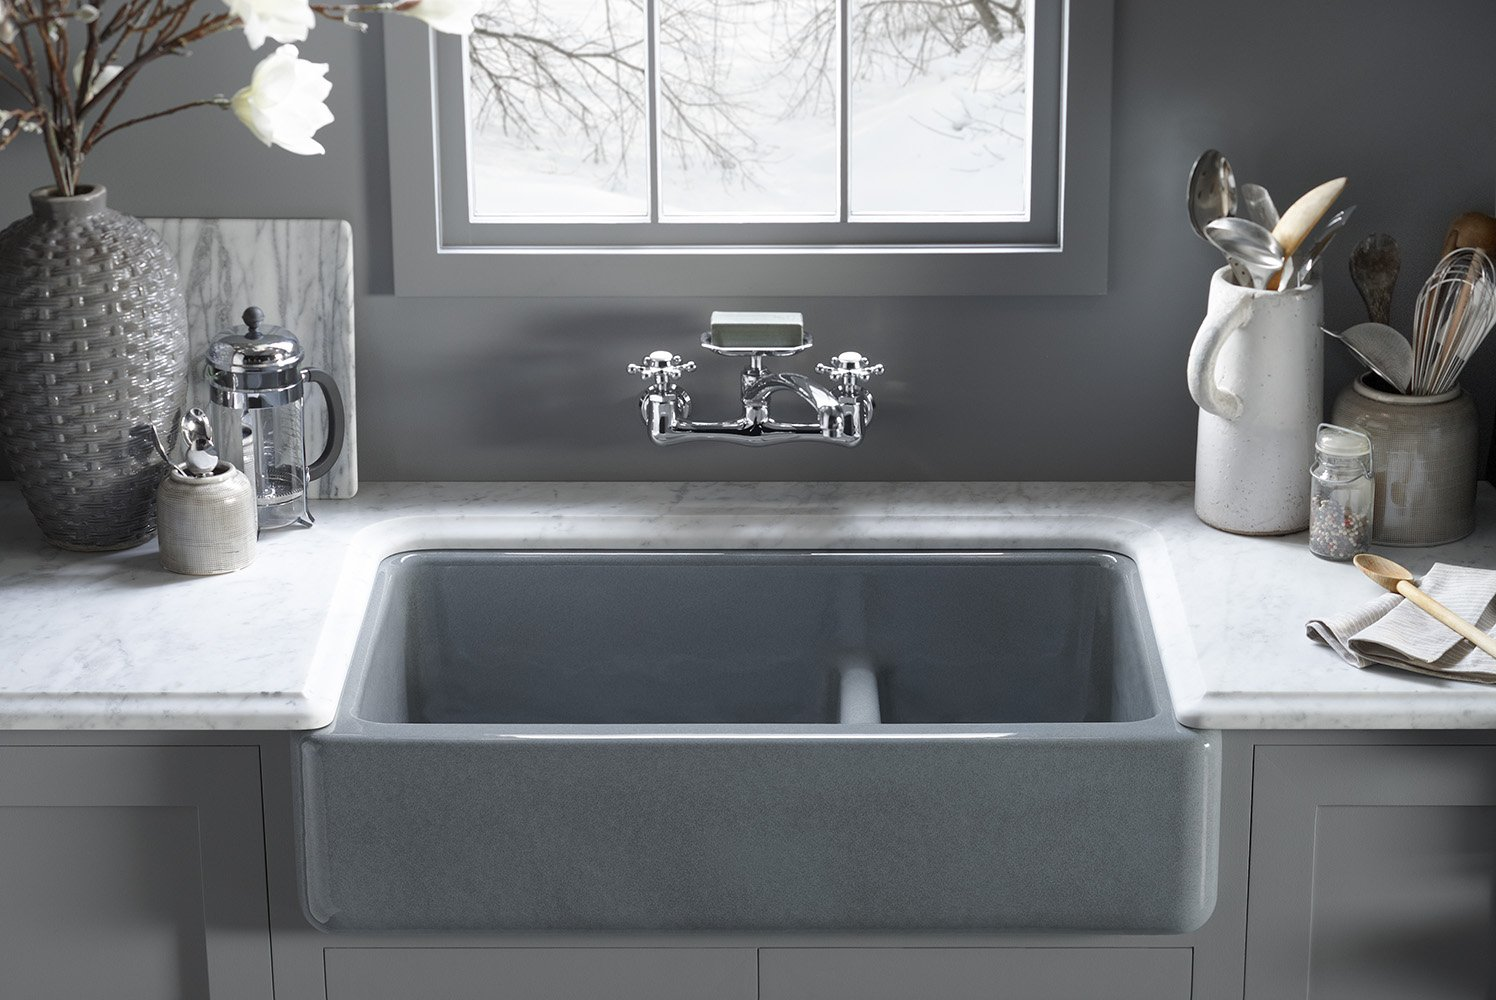 Kohler whitehaven apron sink - Kohler K 6426 0 Whitehaven Smart Divide Self Trimming Under Mount Apron Front Double Bowl Kitchen Sink With Short Apron 35 1 2 Inch X 21 9 16 Inch X